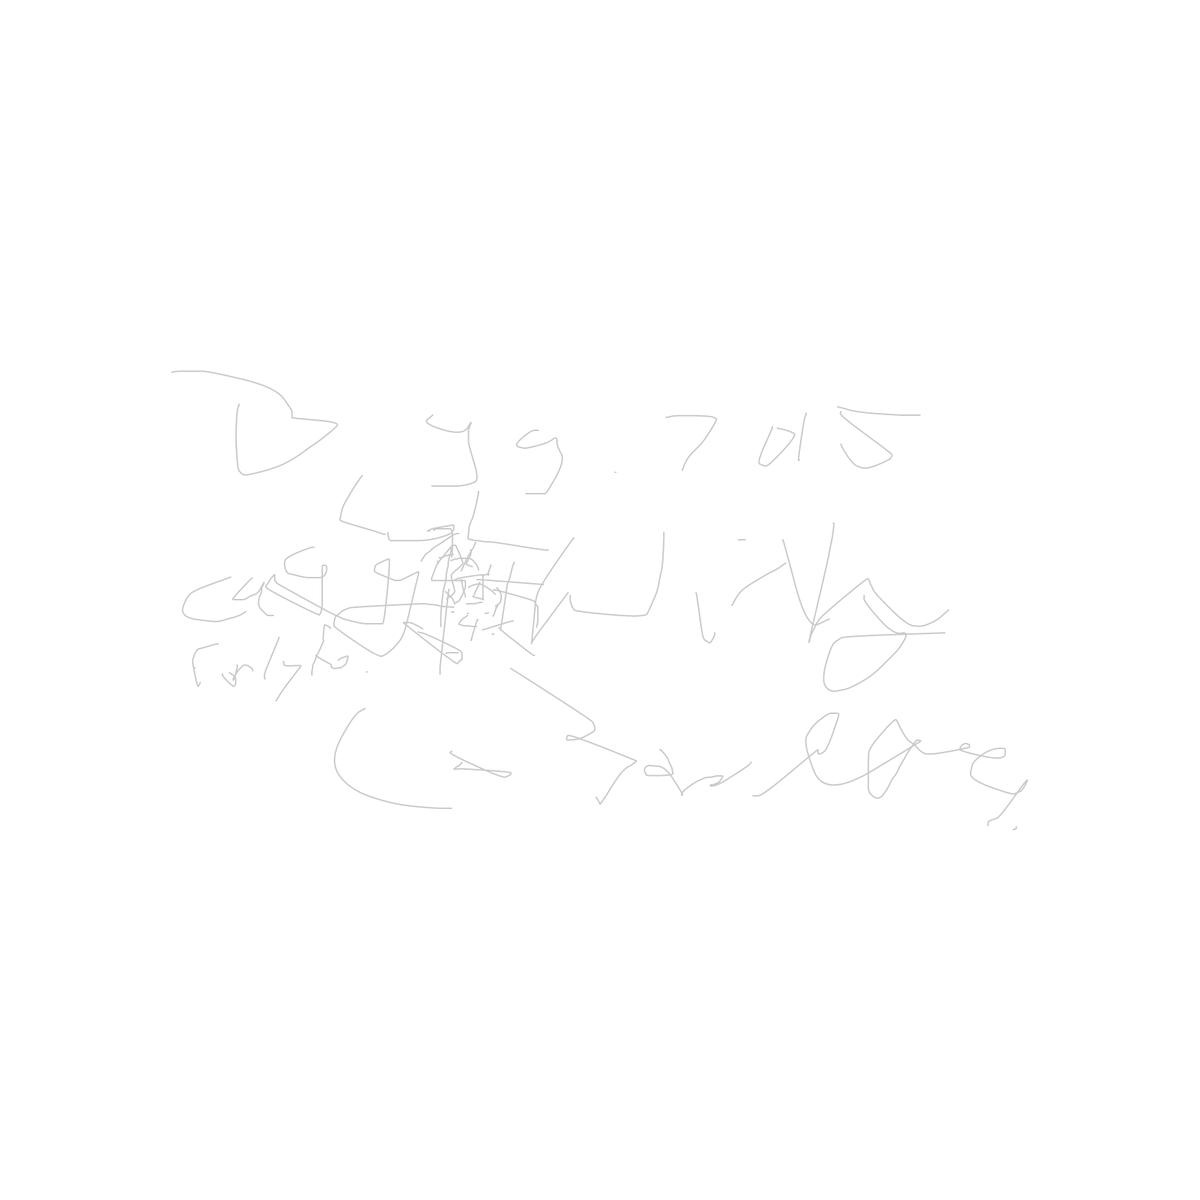 BAAAM drawing#2736 lat:43.8211898803710940lng: -79.2893981933593800